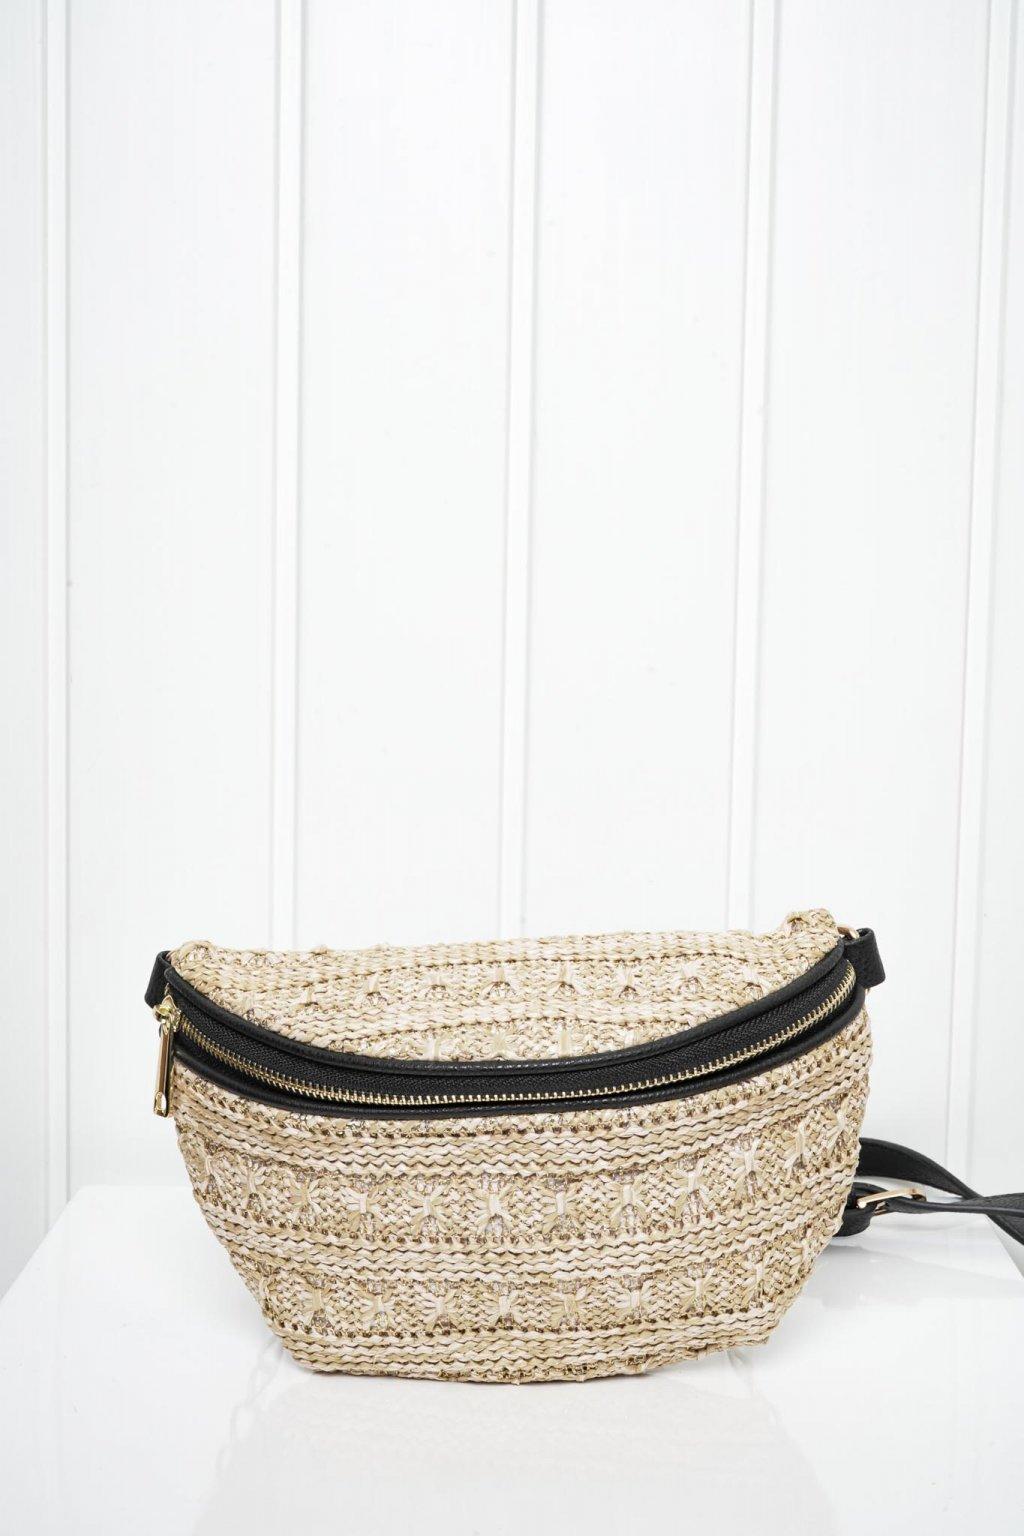 Kabelka, crossbody, ruksak, shopping bag, shopperka, 342